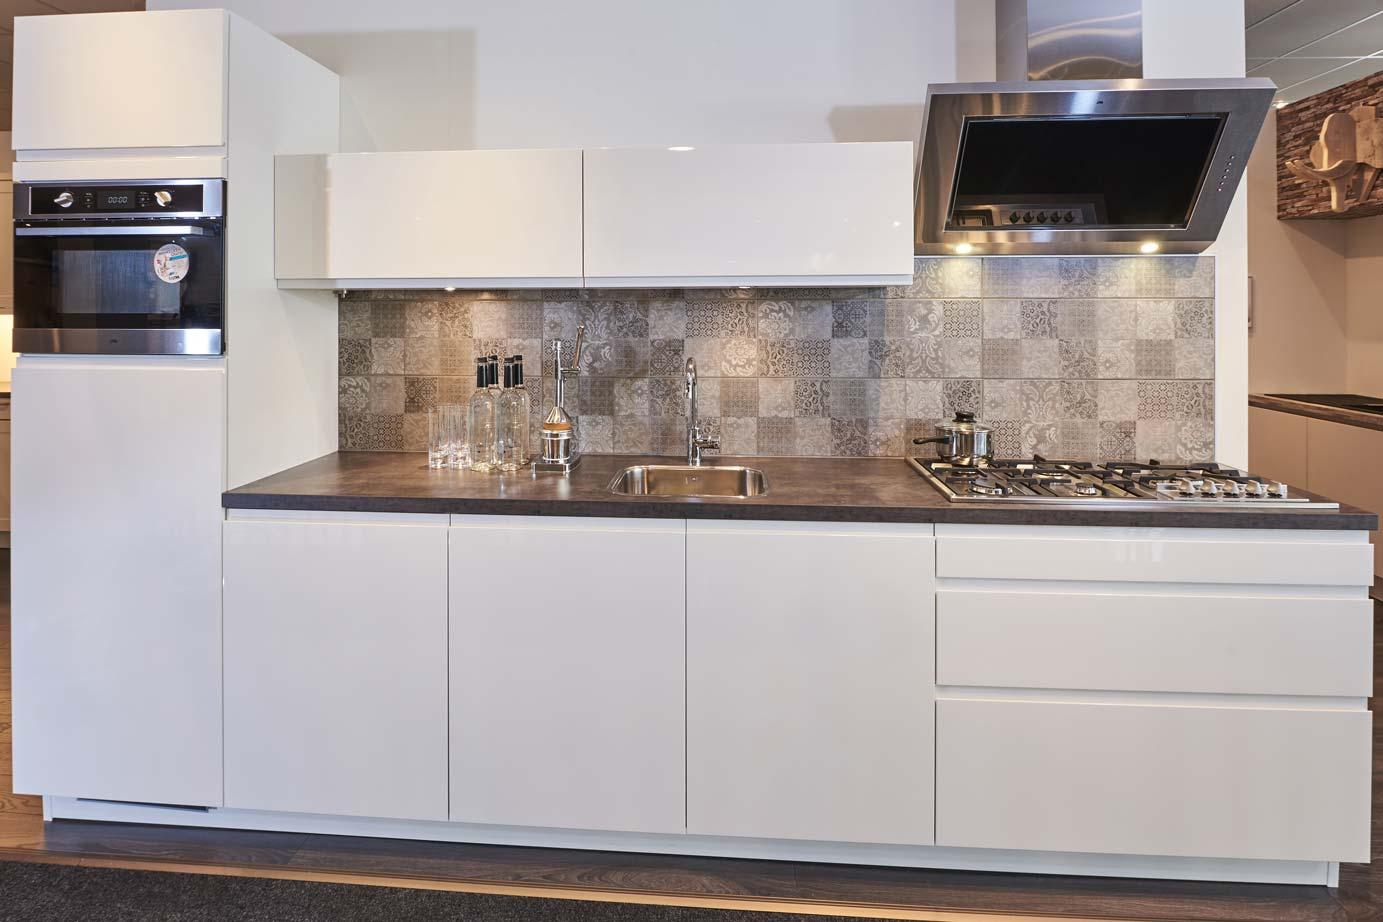 Greeploze Keuken Maken : Greeploze design keuken inclusief kastenwand DB Keukens